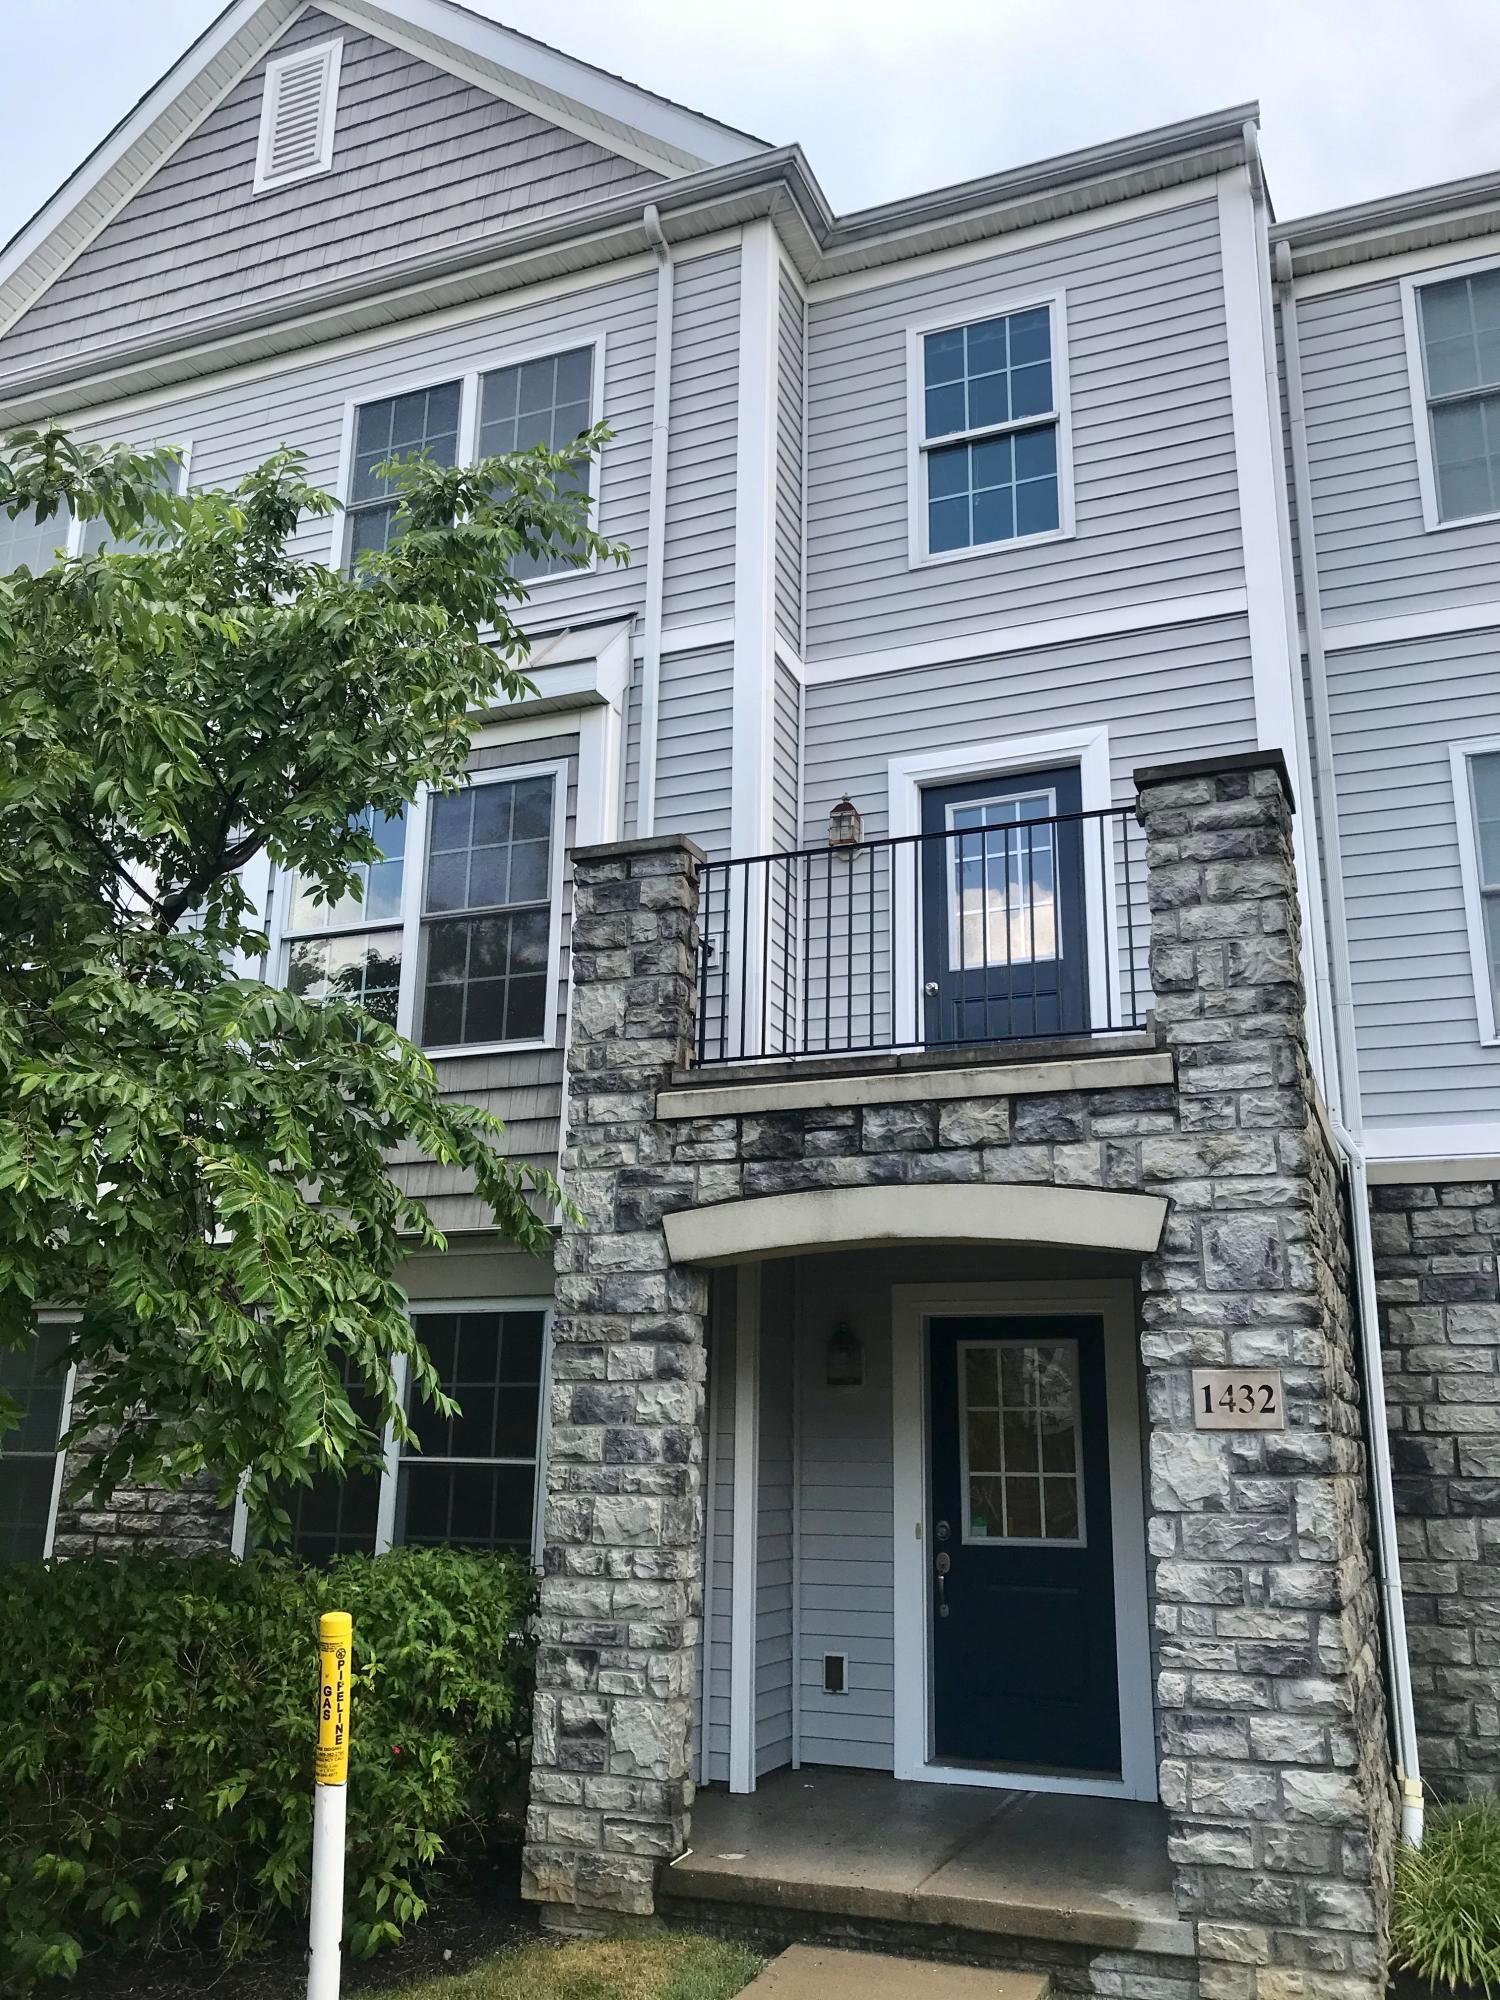 1432 Bloomington Boulevard, Columbus, Ohio 43228, 3 Bedrooms Bedrooms, ,3 BathroomsBathrooms,Residential,For Sale,Bloomington,220022642